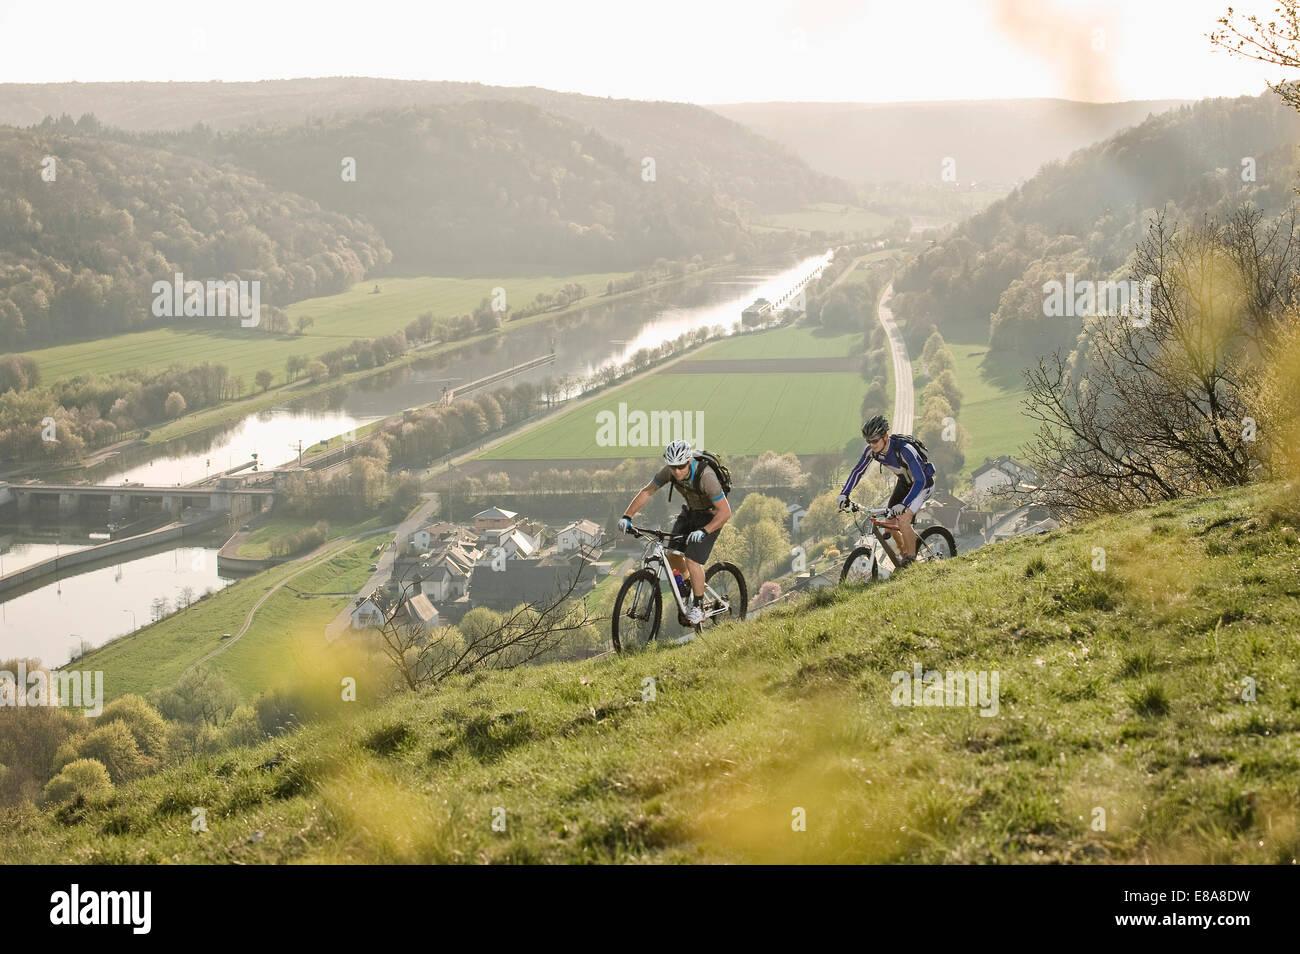 Junge Männer Mountainbiken bei Sonnenuntergang, Bayern, Germany Stockbild